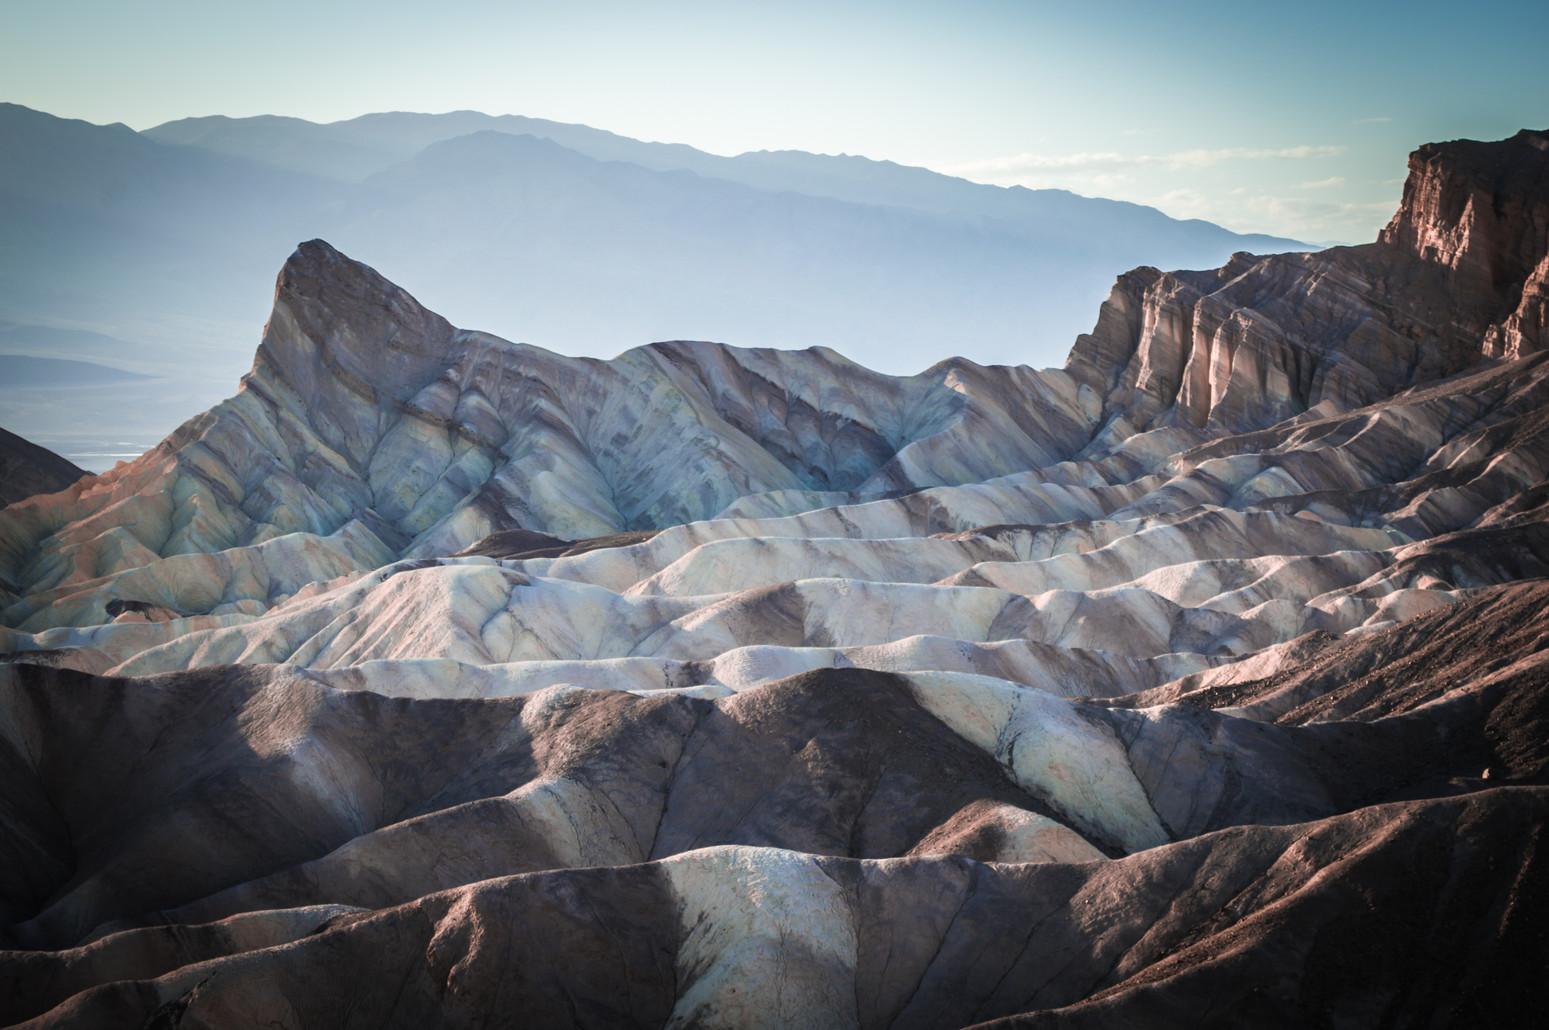 The strikingly striped rocks of Zabriskie Point, Death Valley, California